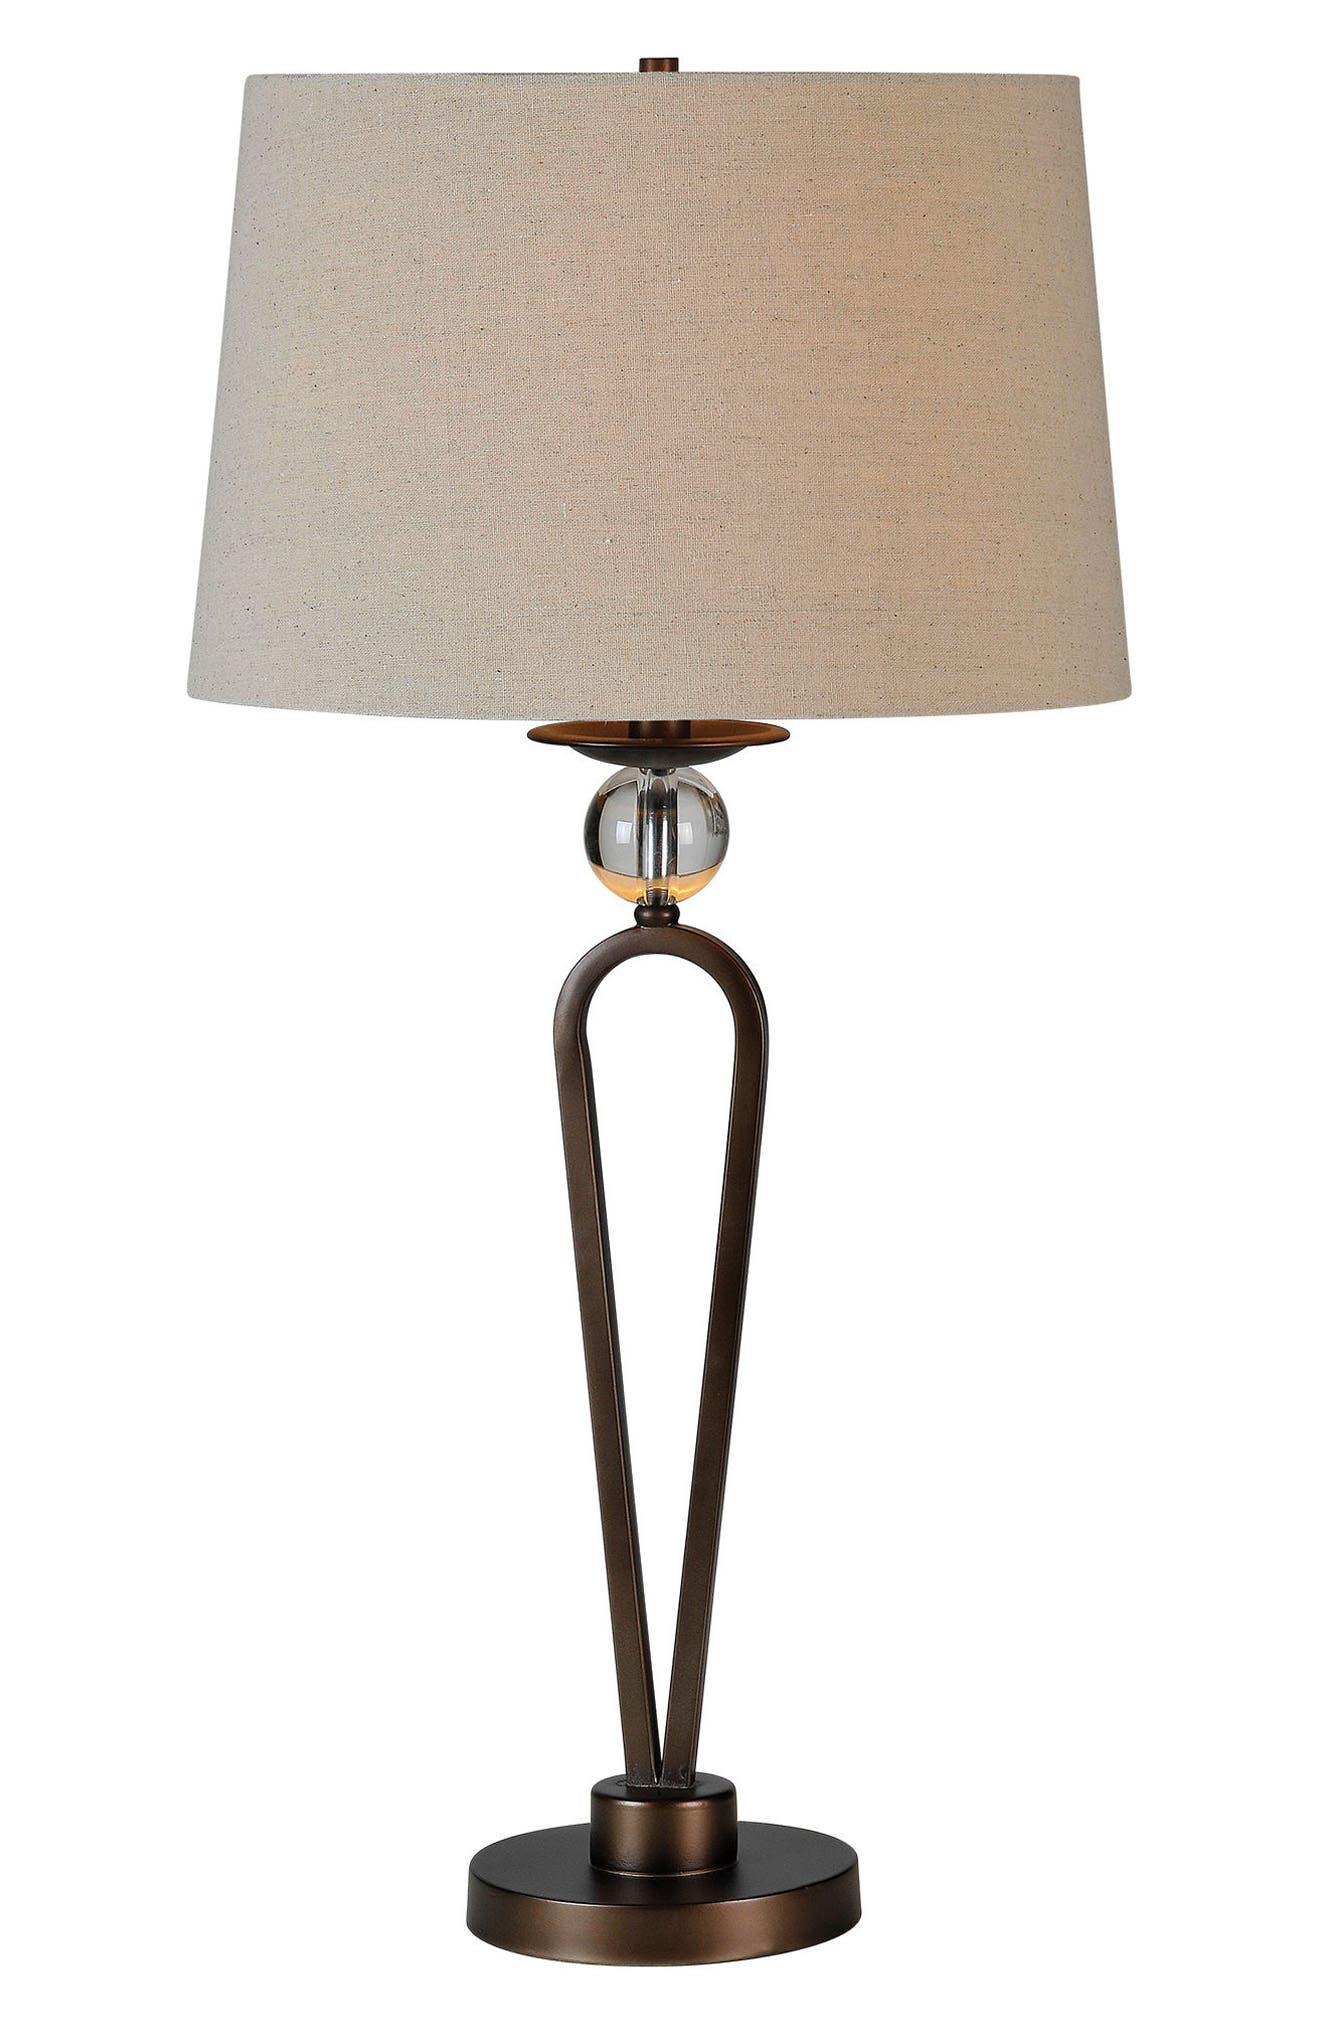 Pembroke Table Lamp,                             Main thumbnail 1, color,                             BRONZE